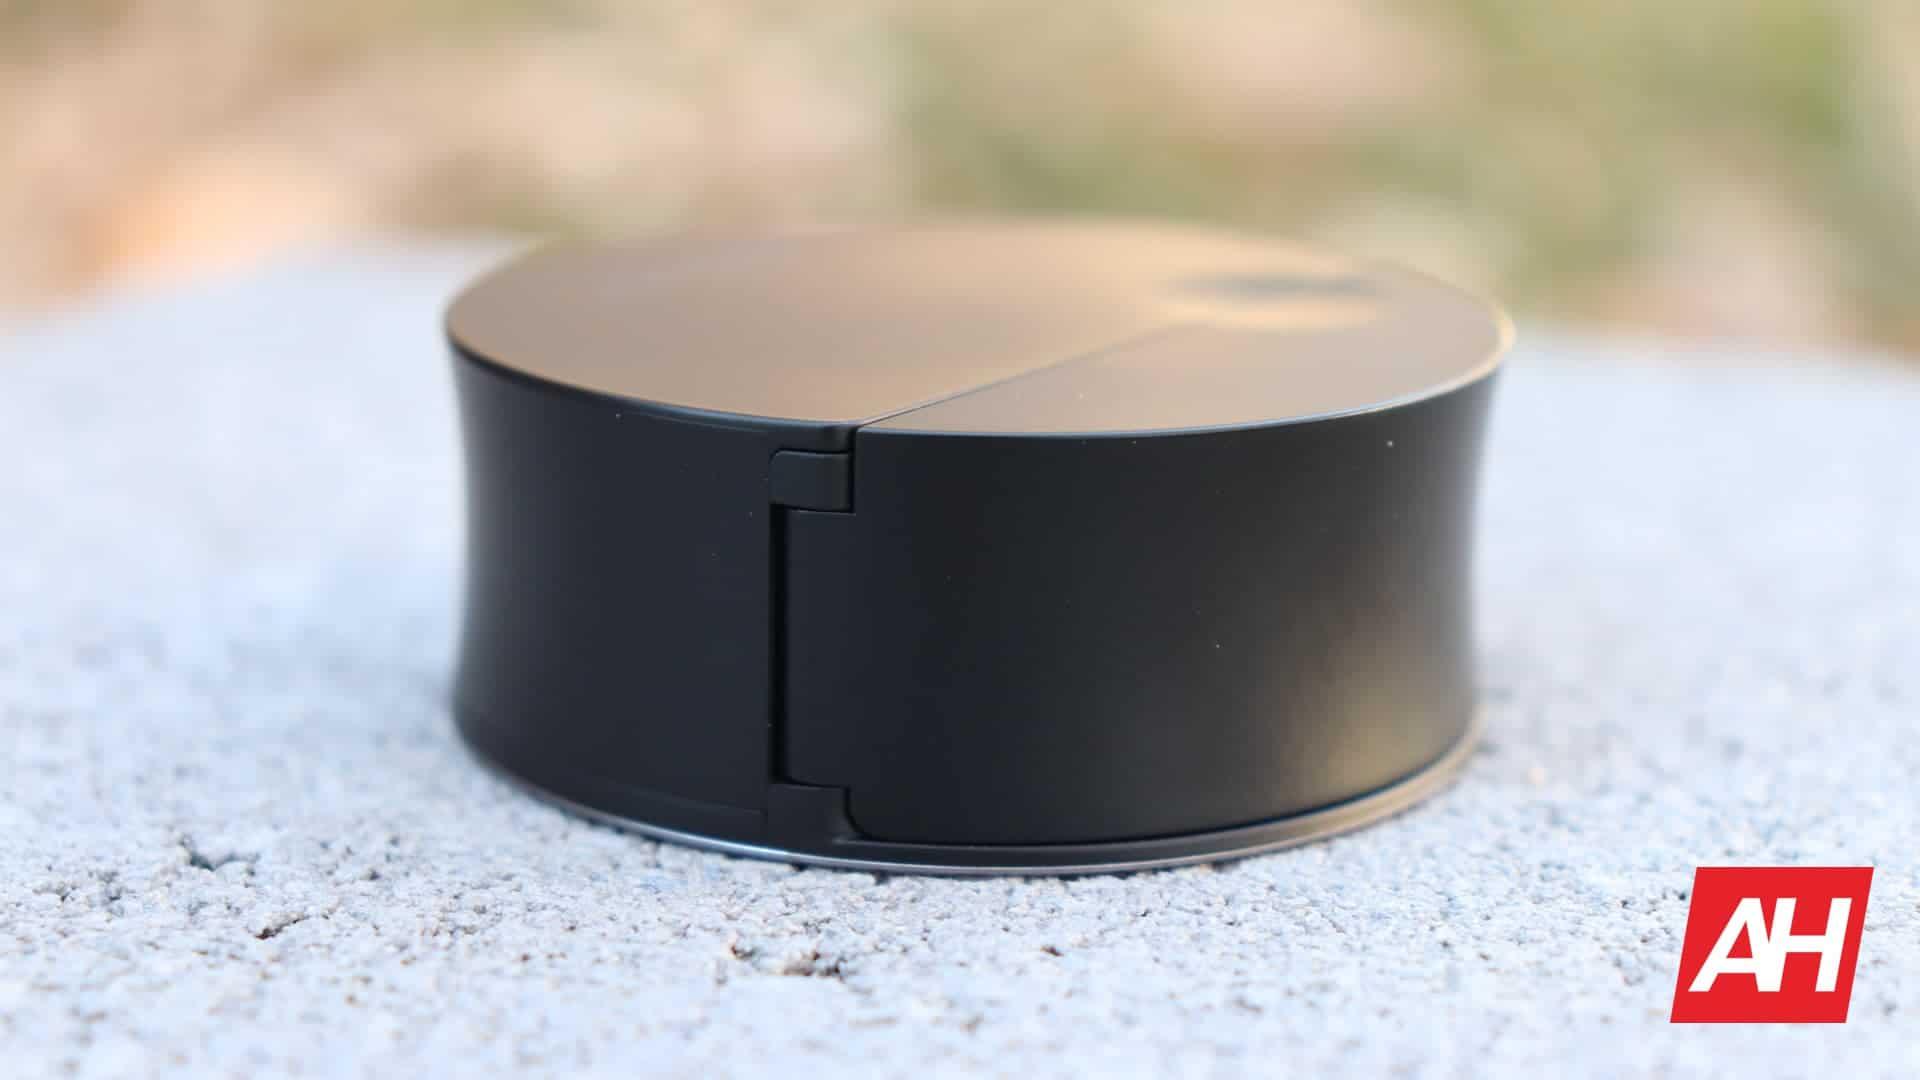 01 2 Oddict Twig Earbuds Hardware Review DG AH 2020